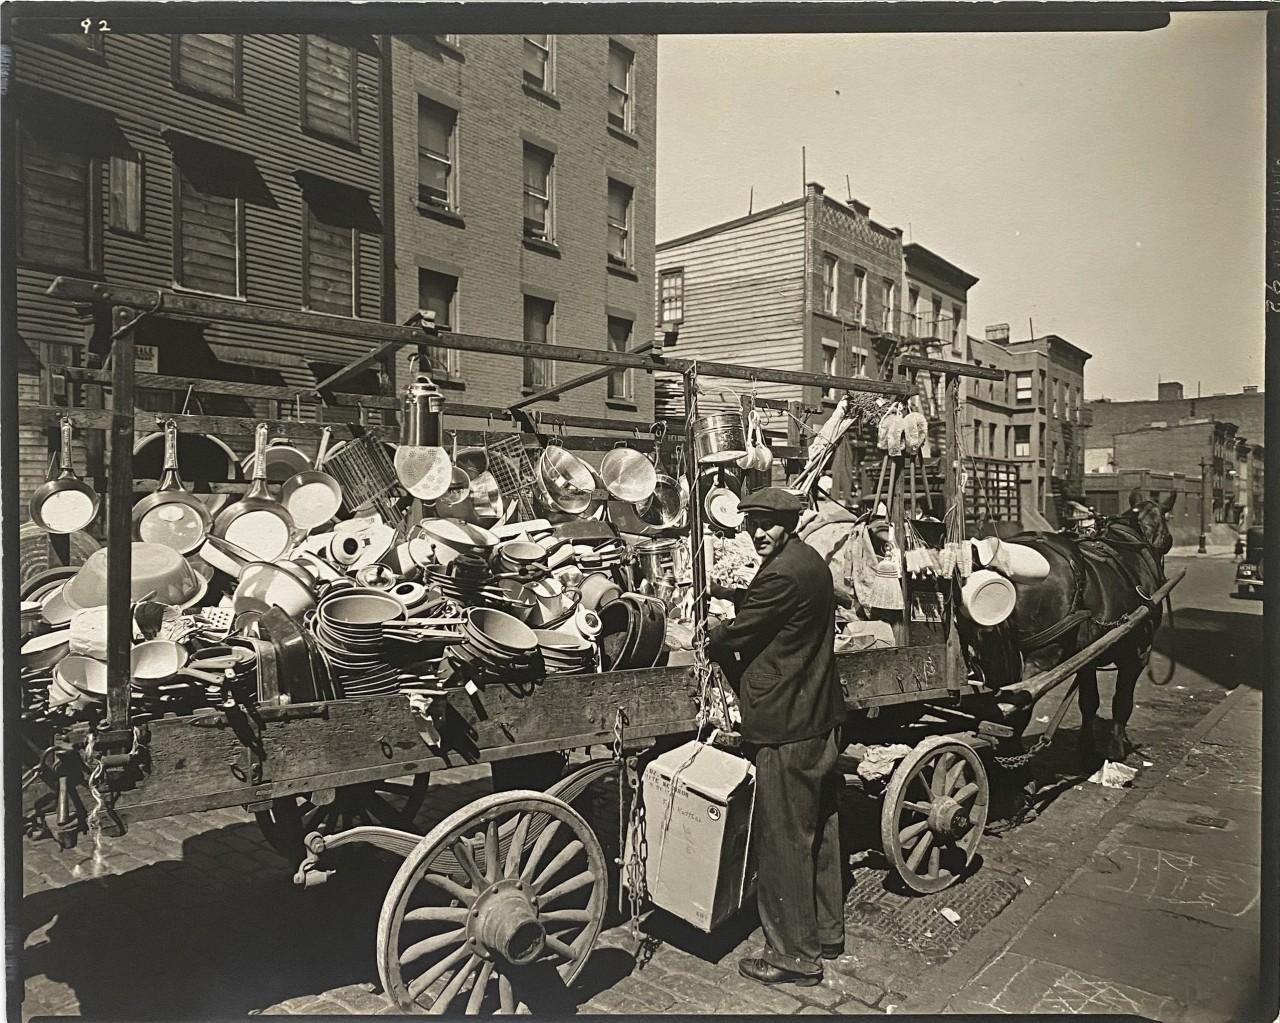 Магазин на колёсах, Бруклин, Нью-Йорк, 1936. Фотограф Беренис Эбботт